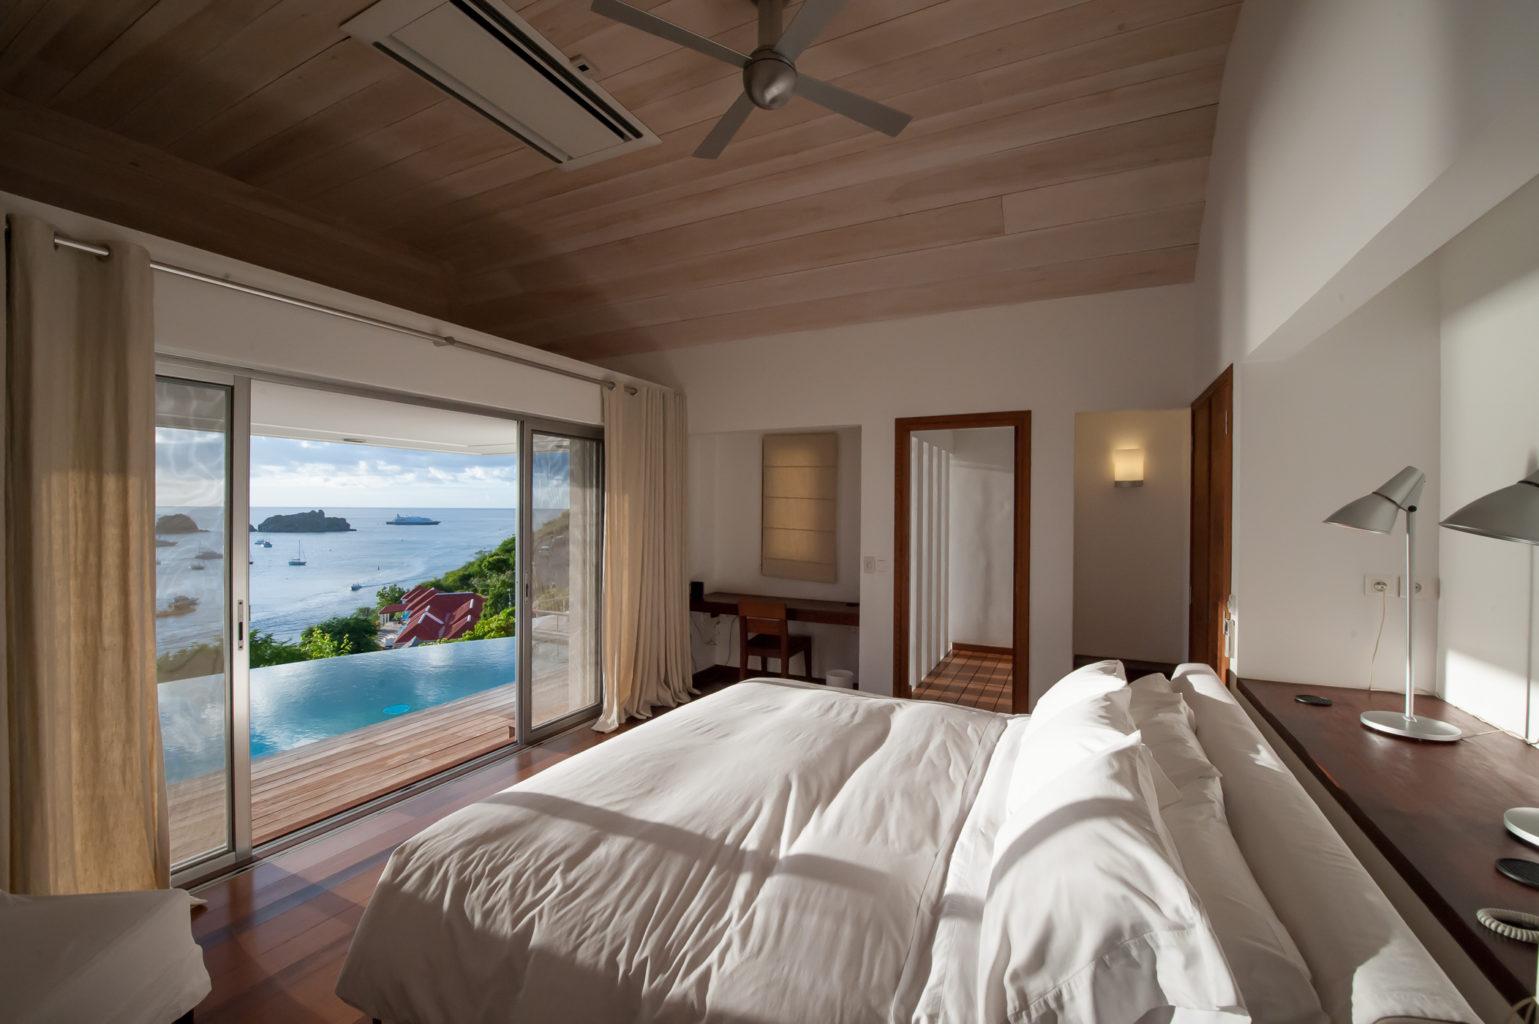 Villa Lam - Modern Villa for Rent with Fitness Equipment St Barth Gustavia - Bedroom